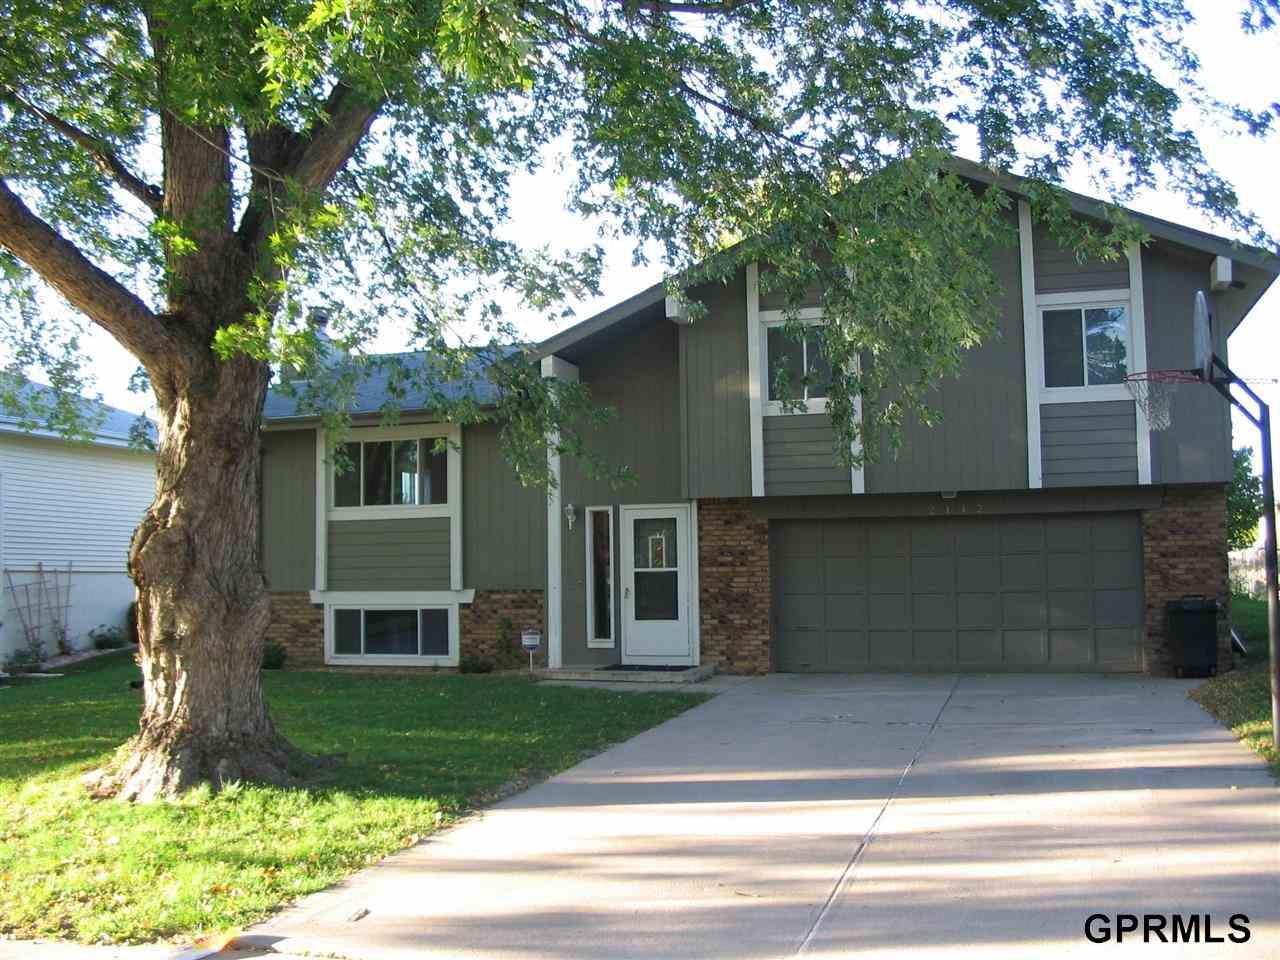 Rental Homes for Rent, ListingId:30223020, location: 2112 Nottingham Bellevue 68123